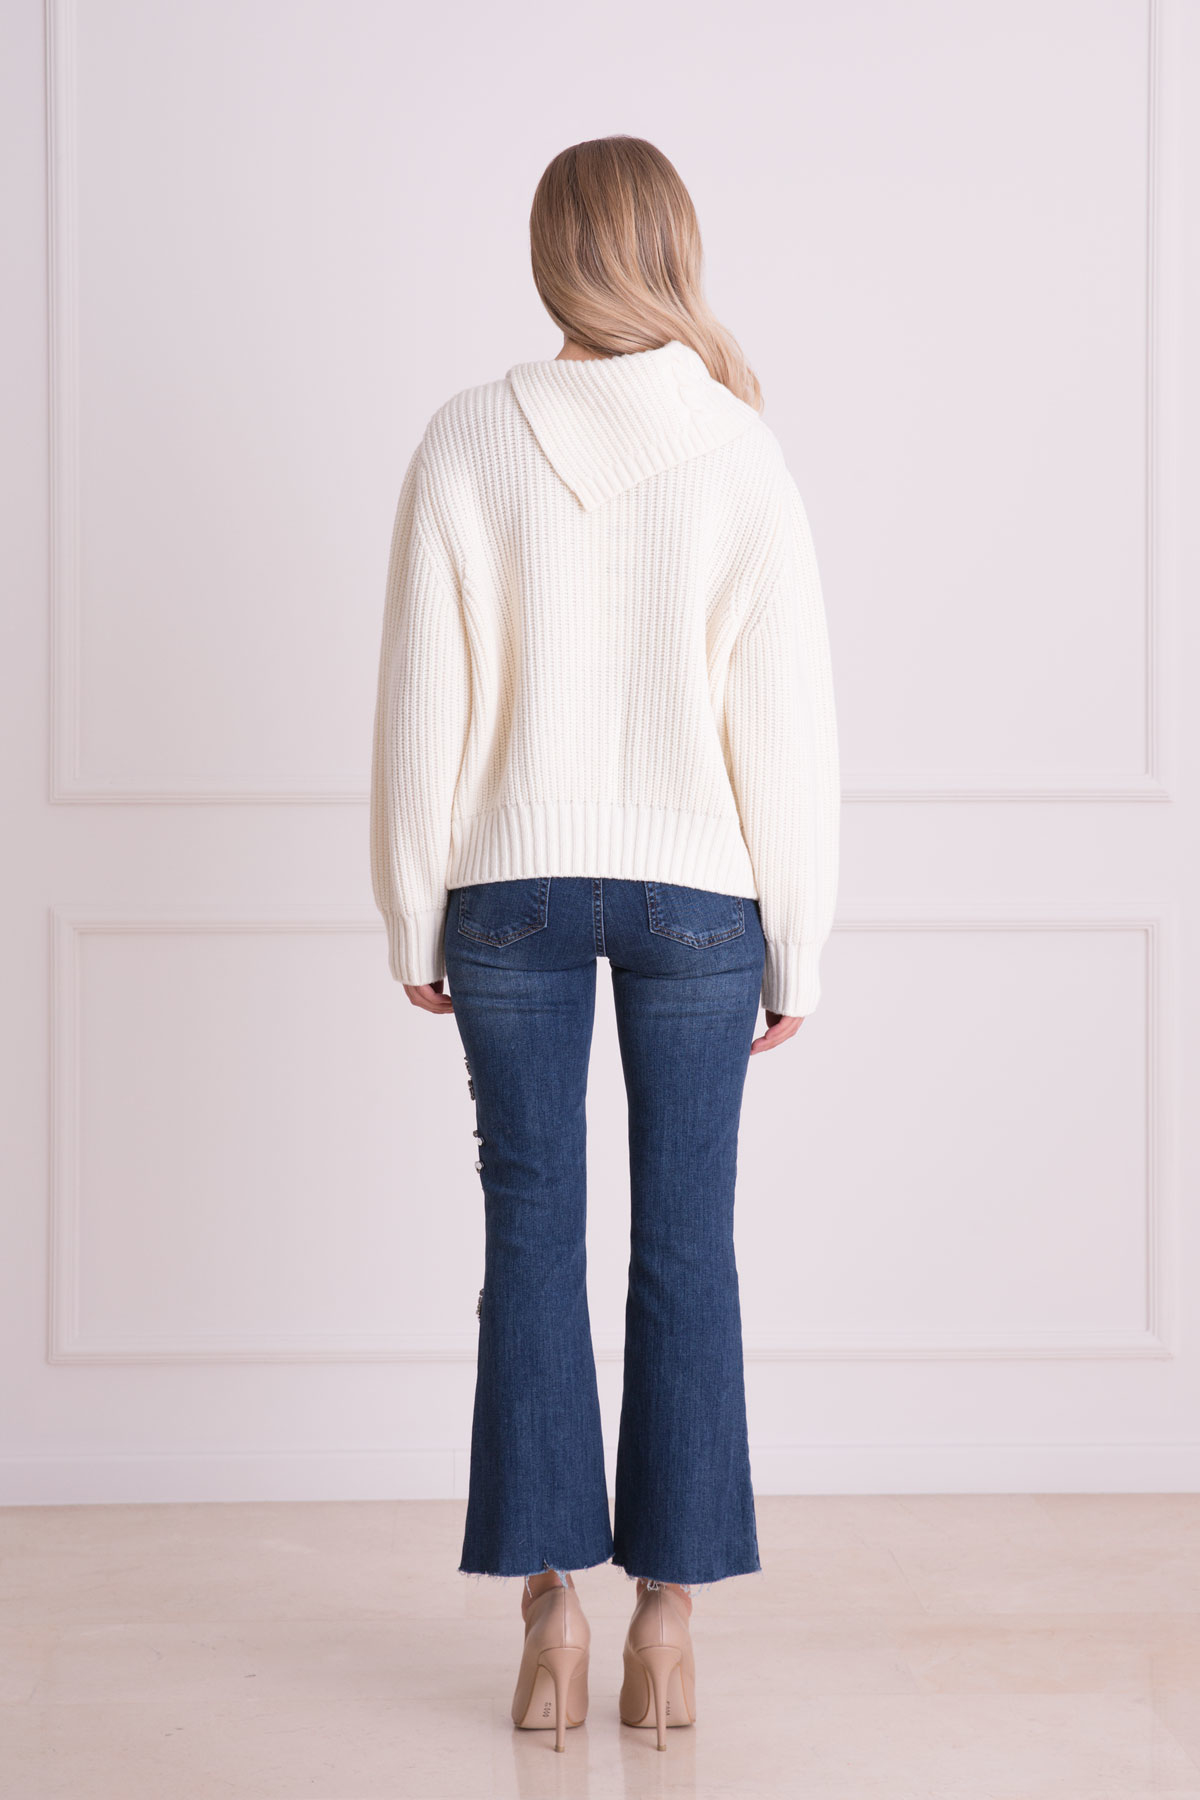 Taş İşlemeli Bol Paça Mavi Jean Pantolon